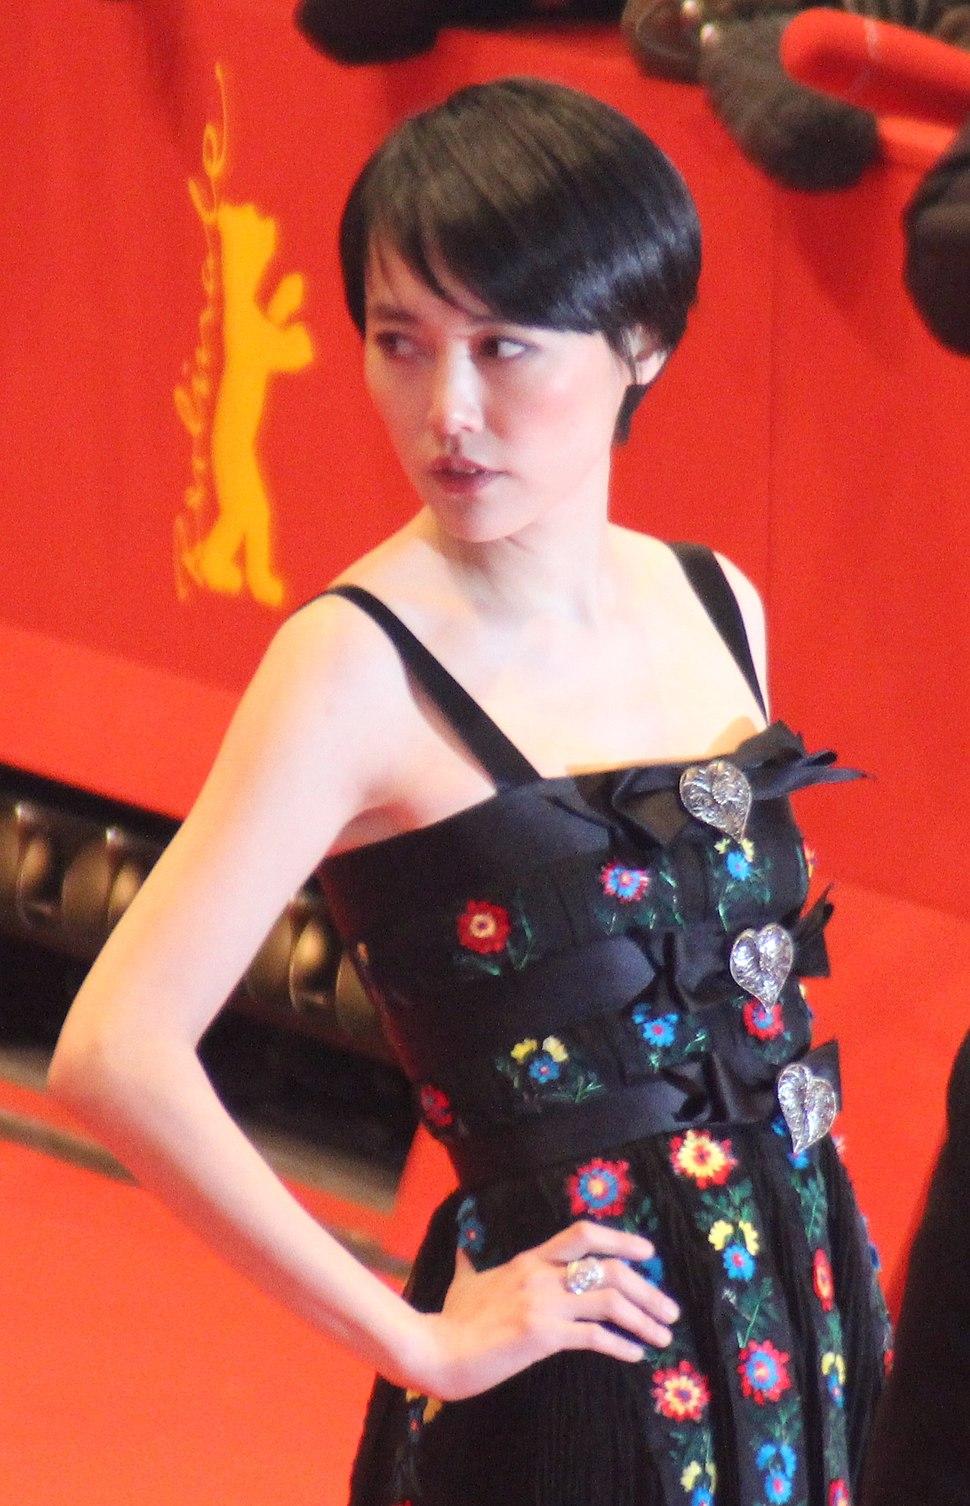 Rinko Kikuchi Berlinale 2015